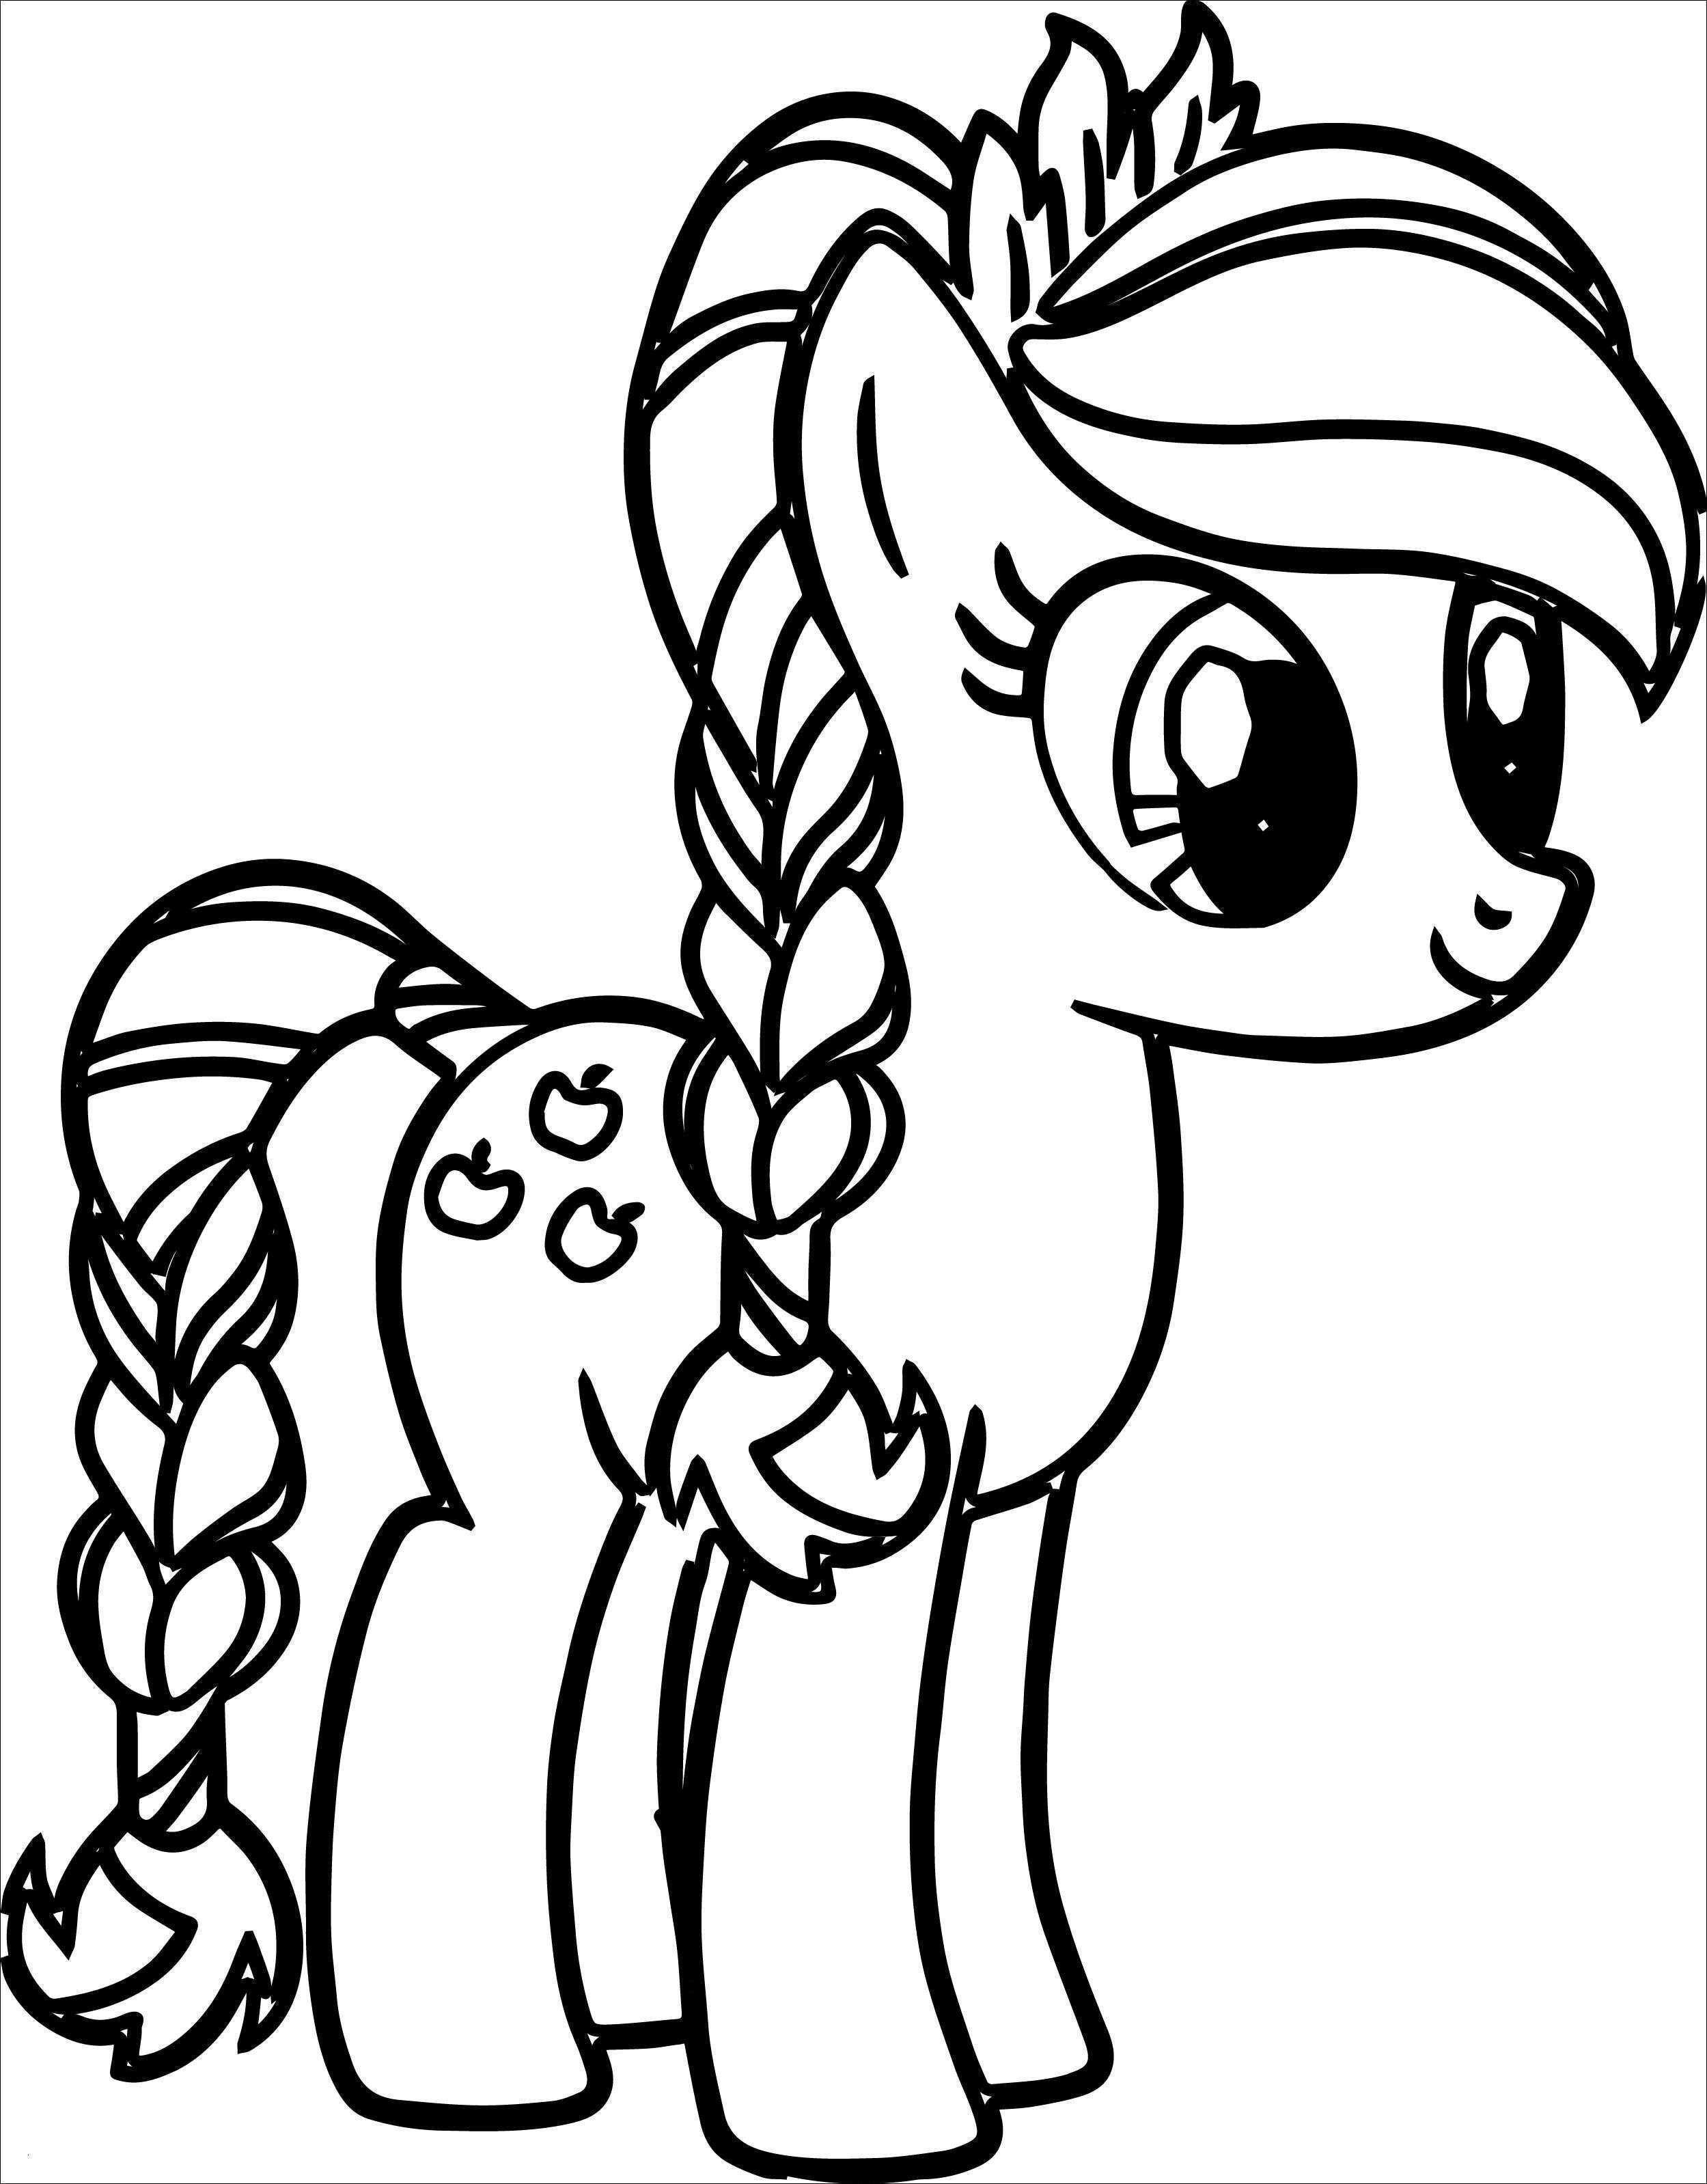 Ausmalbilder Little Pony Genial My Little Pony Ausmalbilder Bildnis 38 Ausmalbilder Little Pony Fotografieren